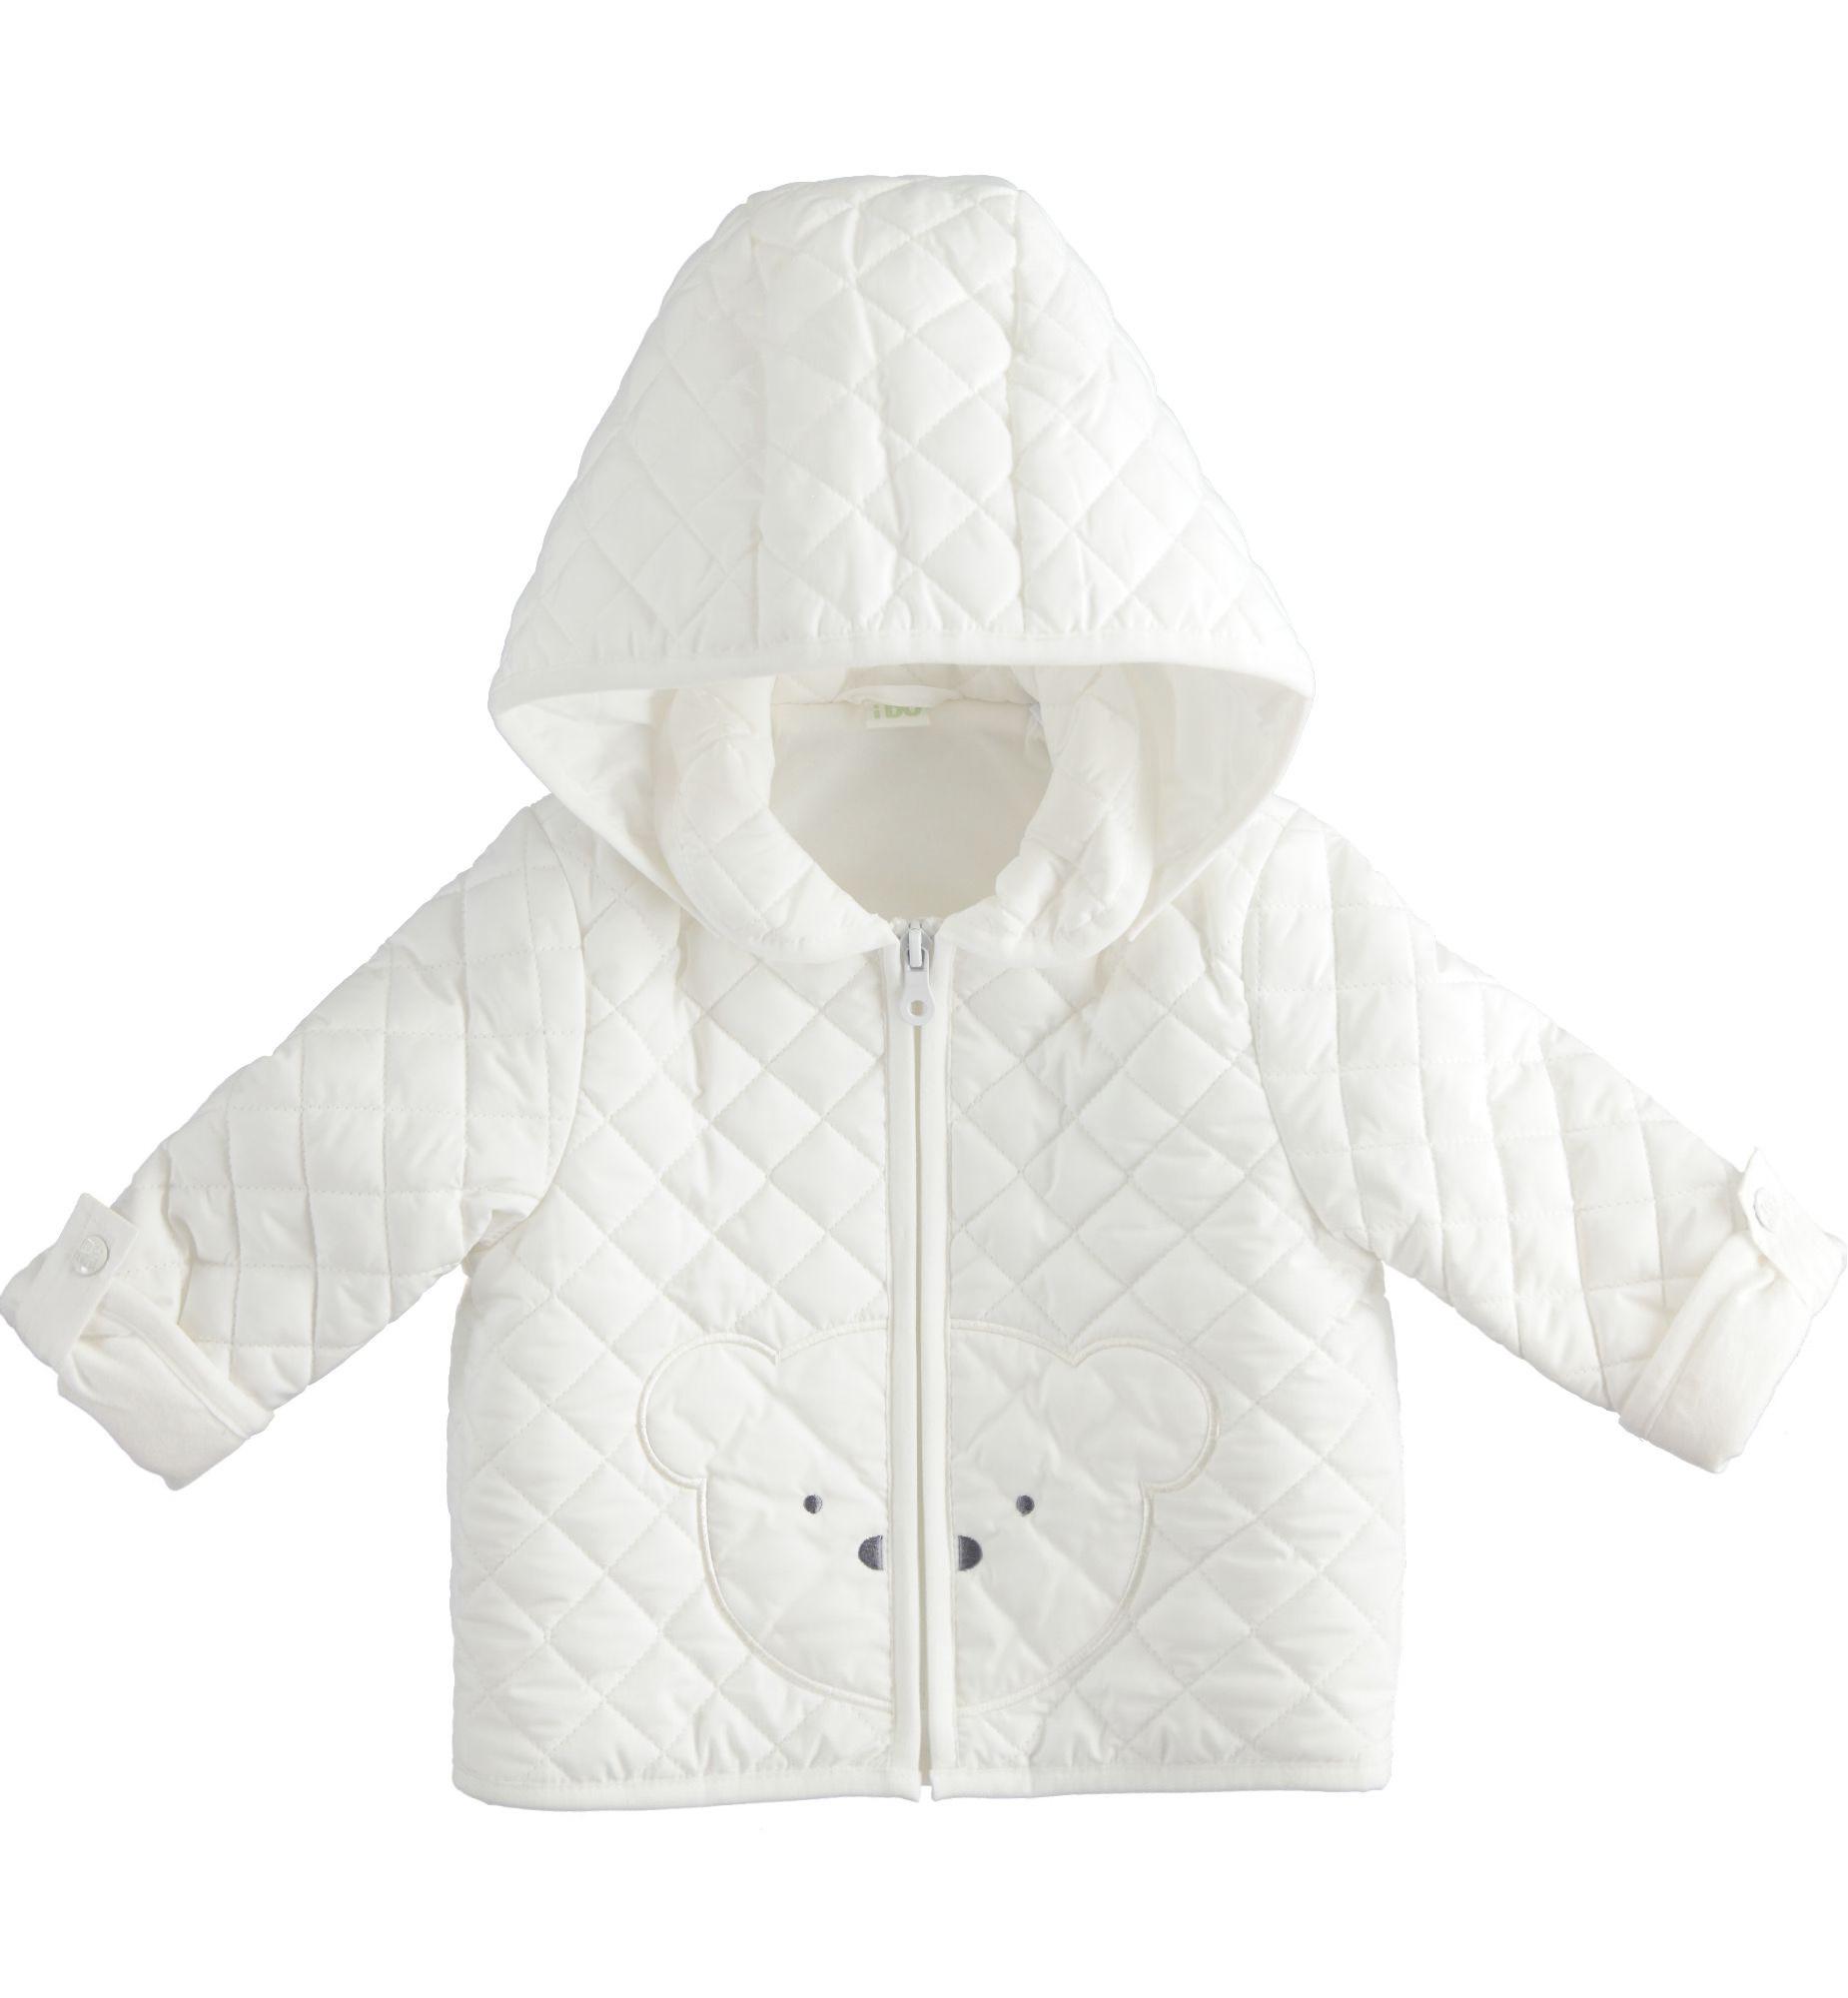 Ido iDO White Padded Bear Jacket - 43299